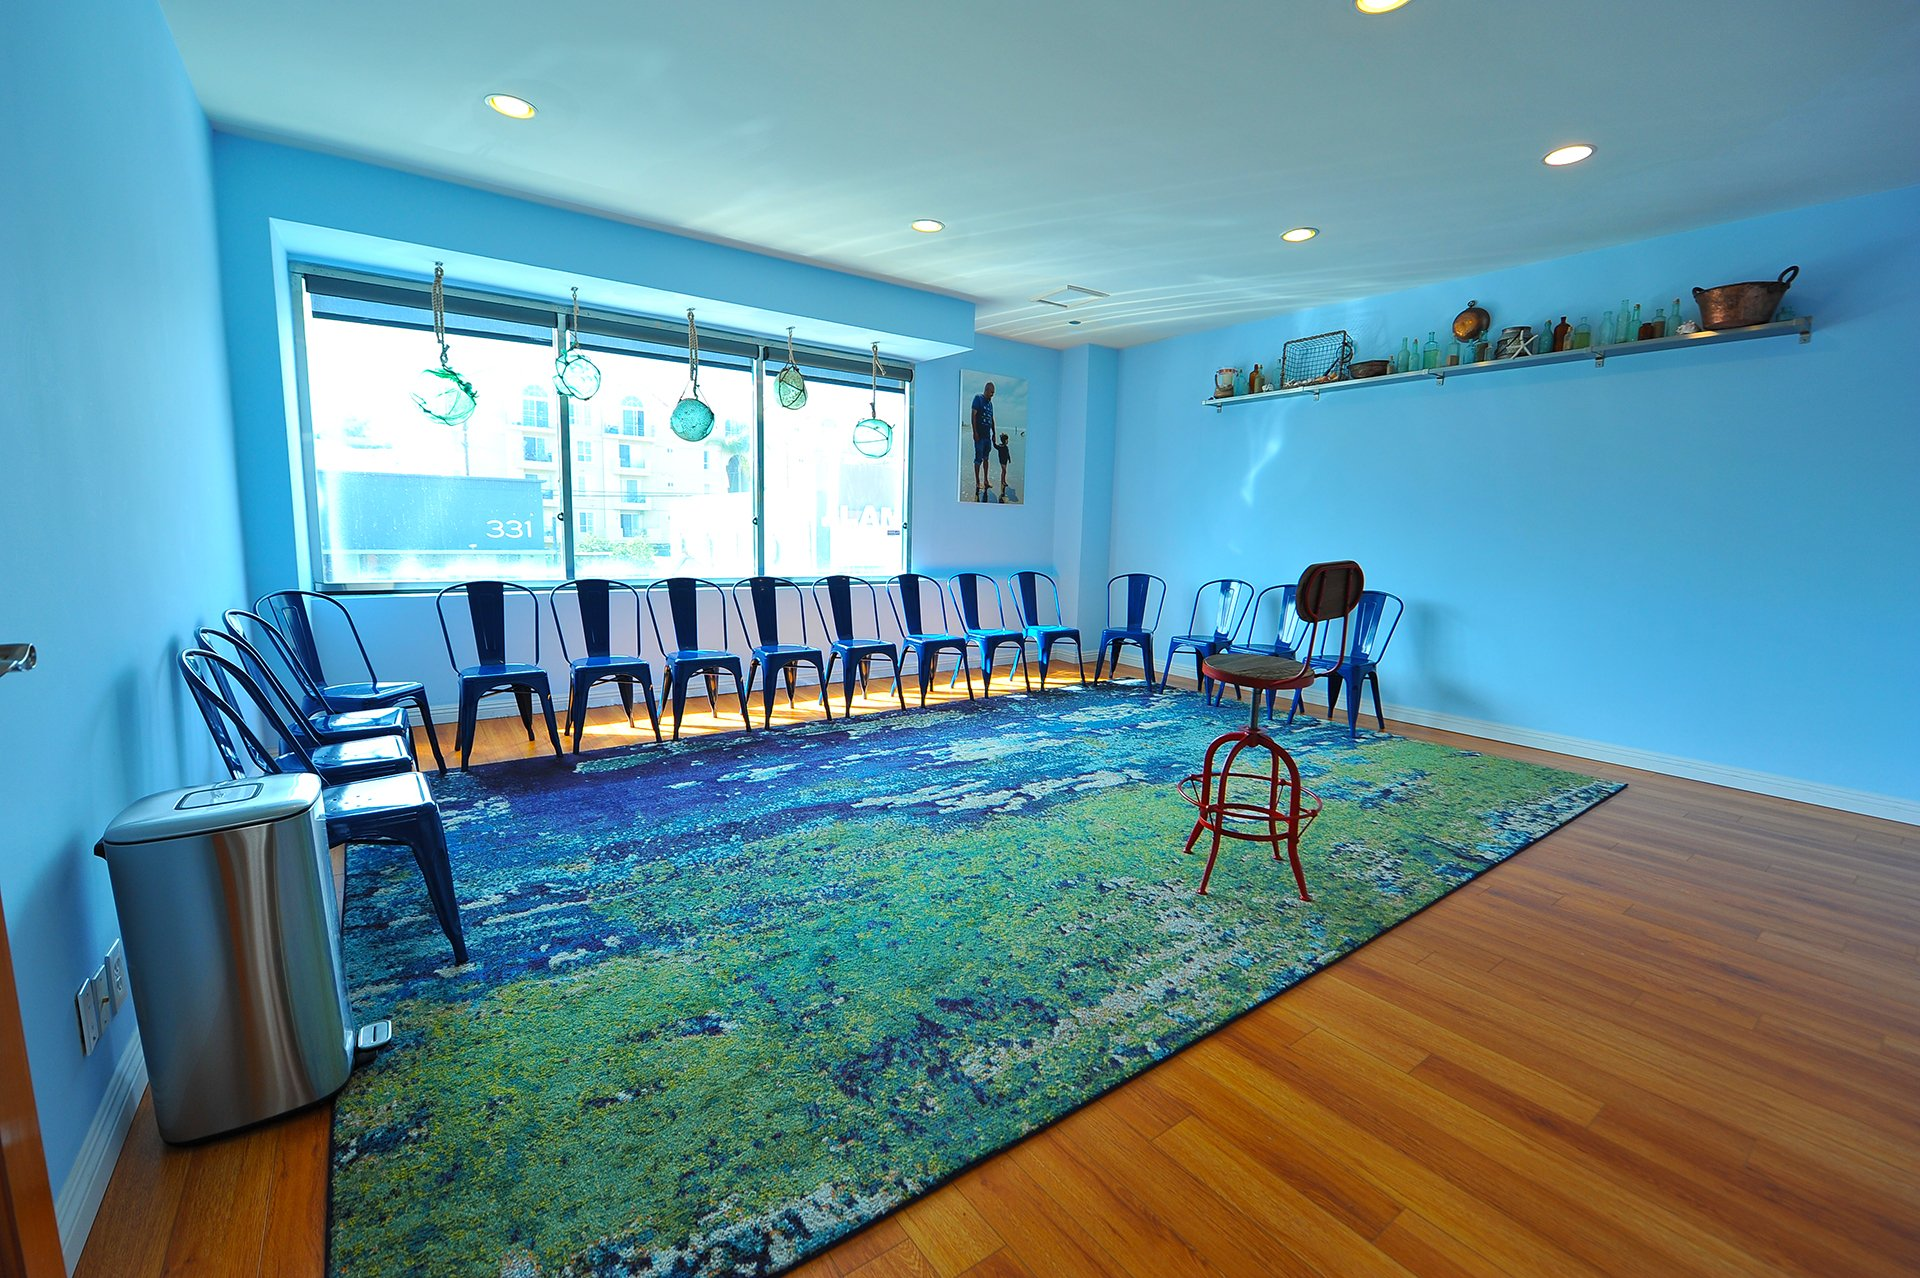 Zak Barnett Studios Classroom - Beach Room- Studio Environment